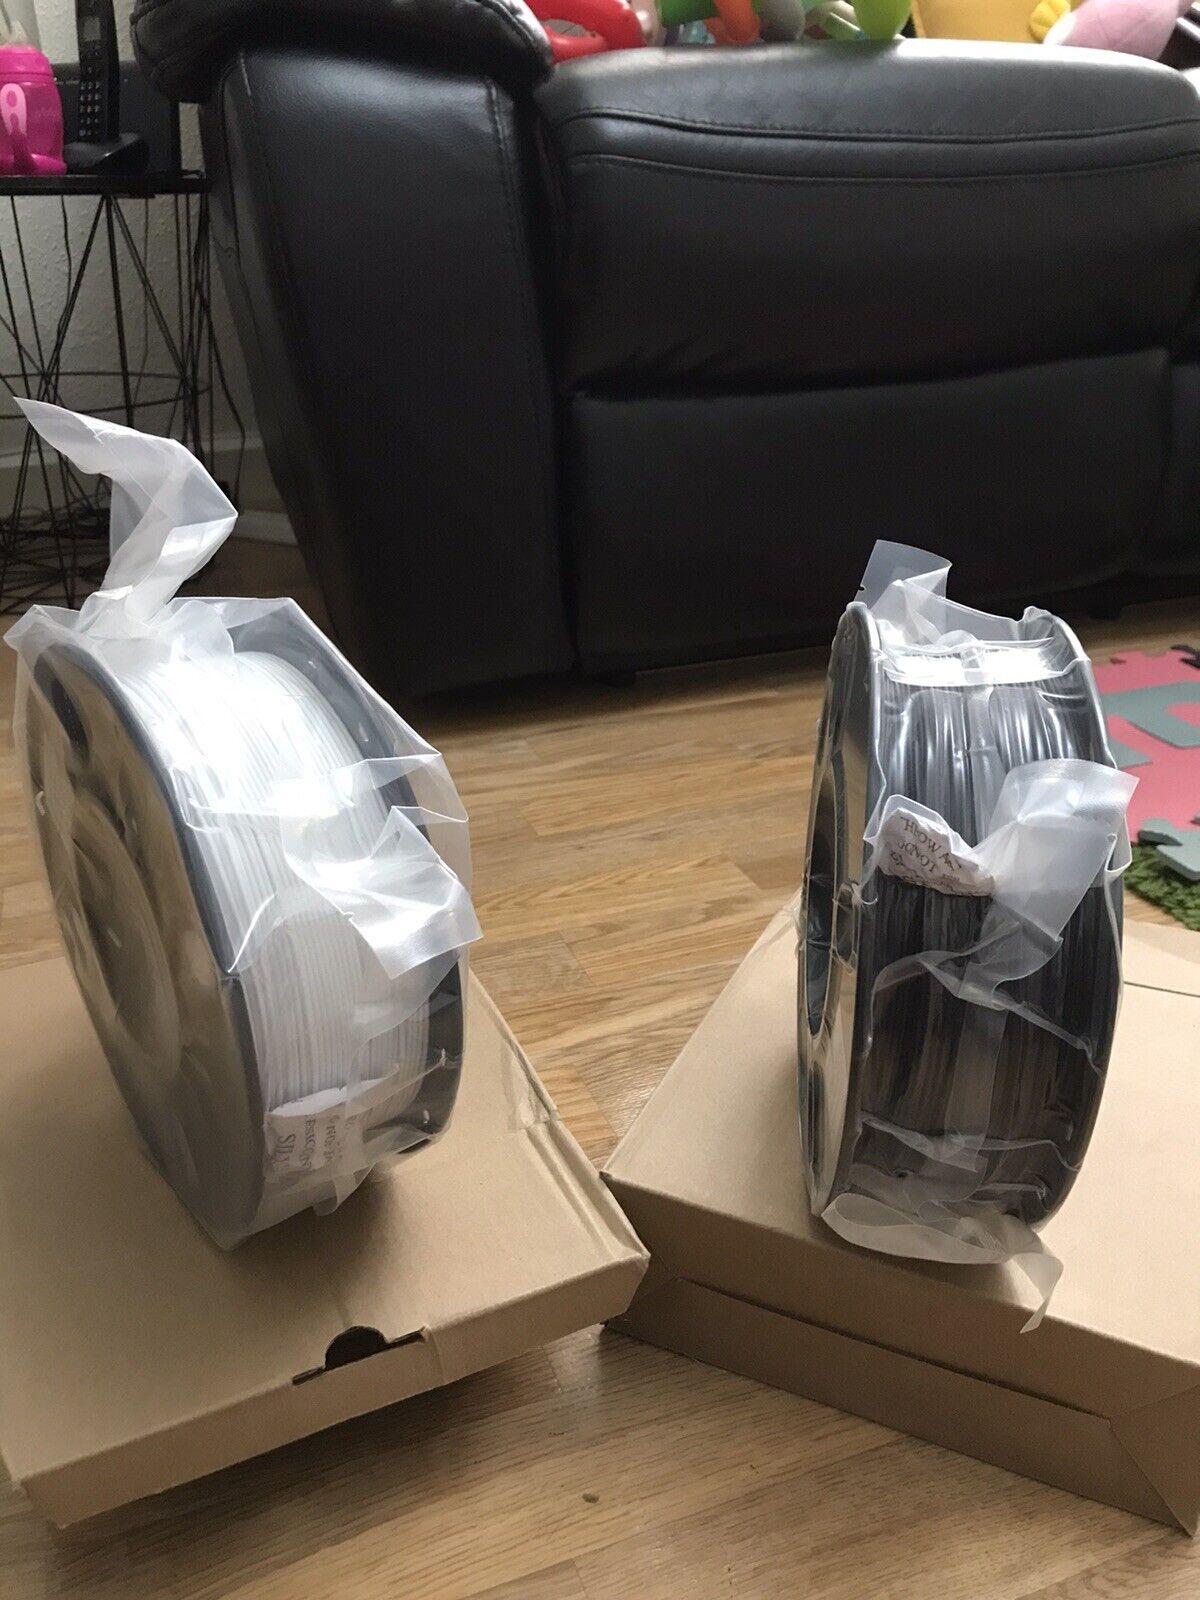 pla 3d printer filament 1.75mm 1 items only choice 1kg black/white